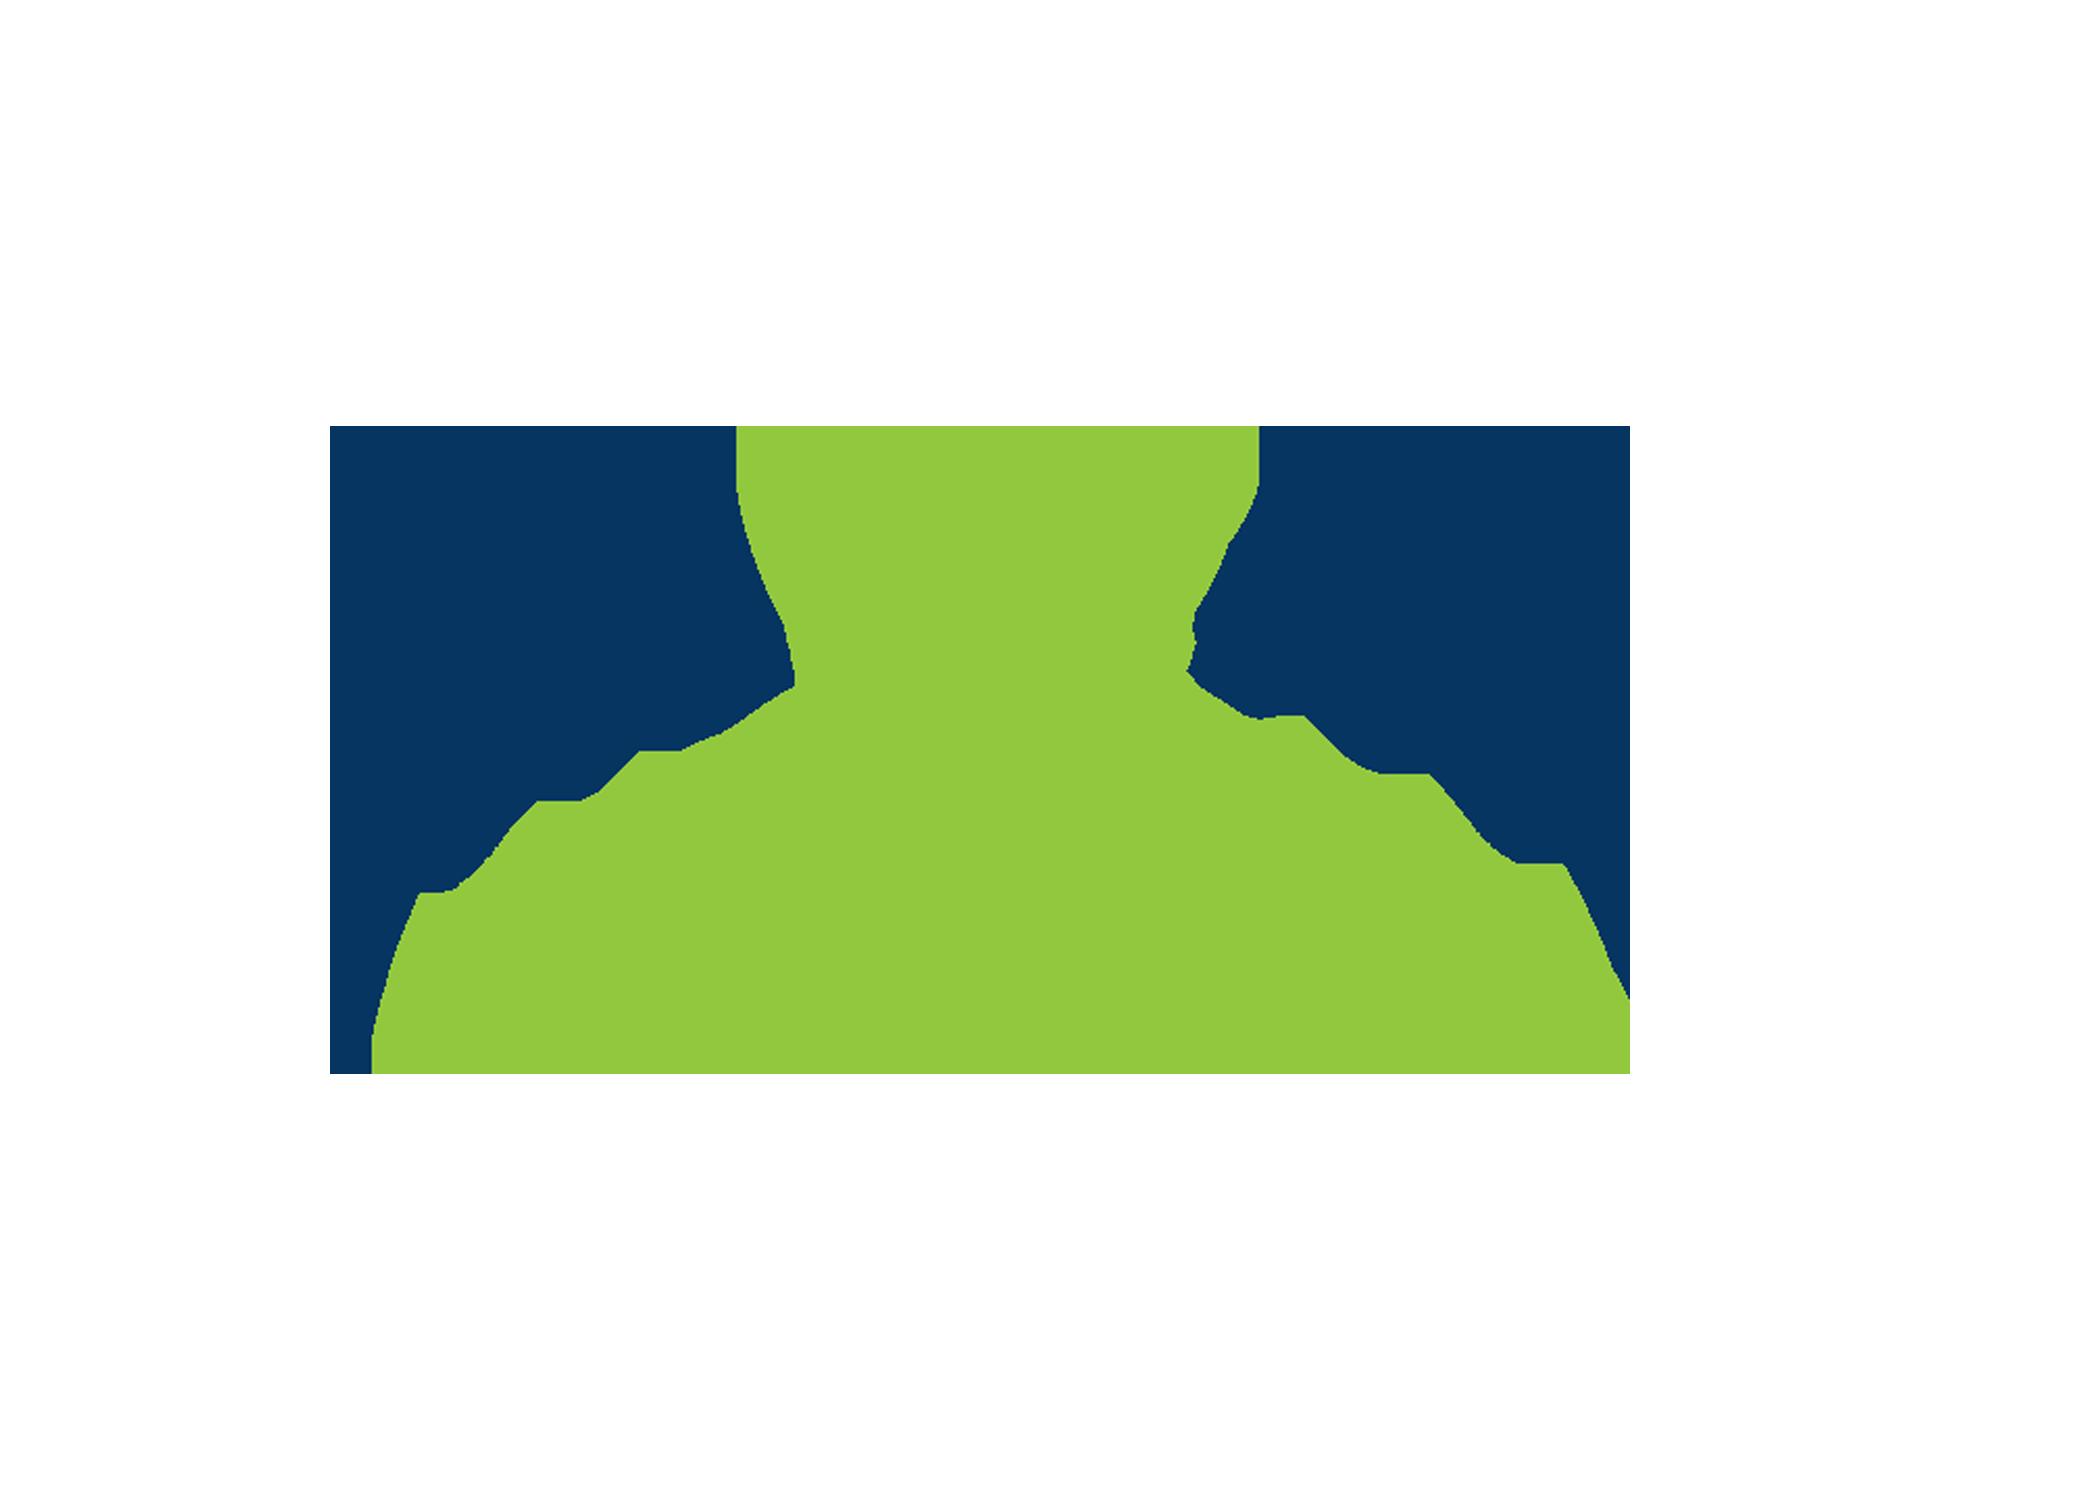 Triskele icon with ESTD dates